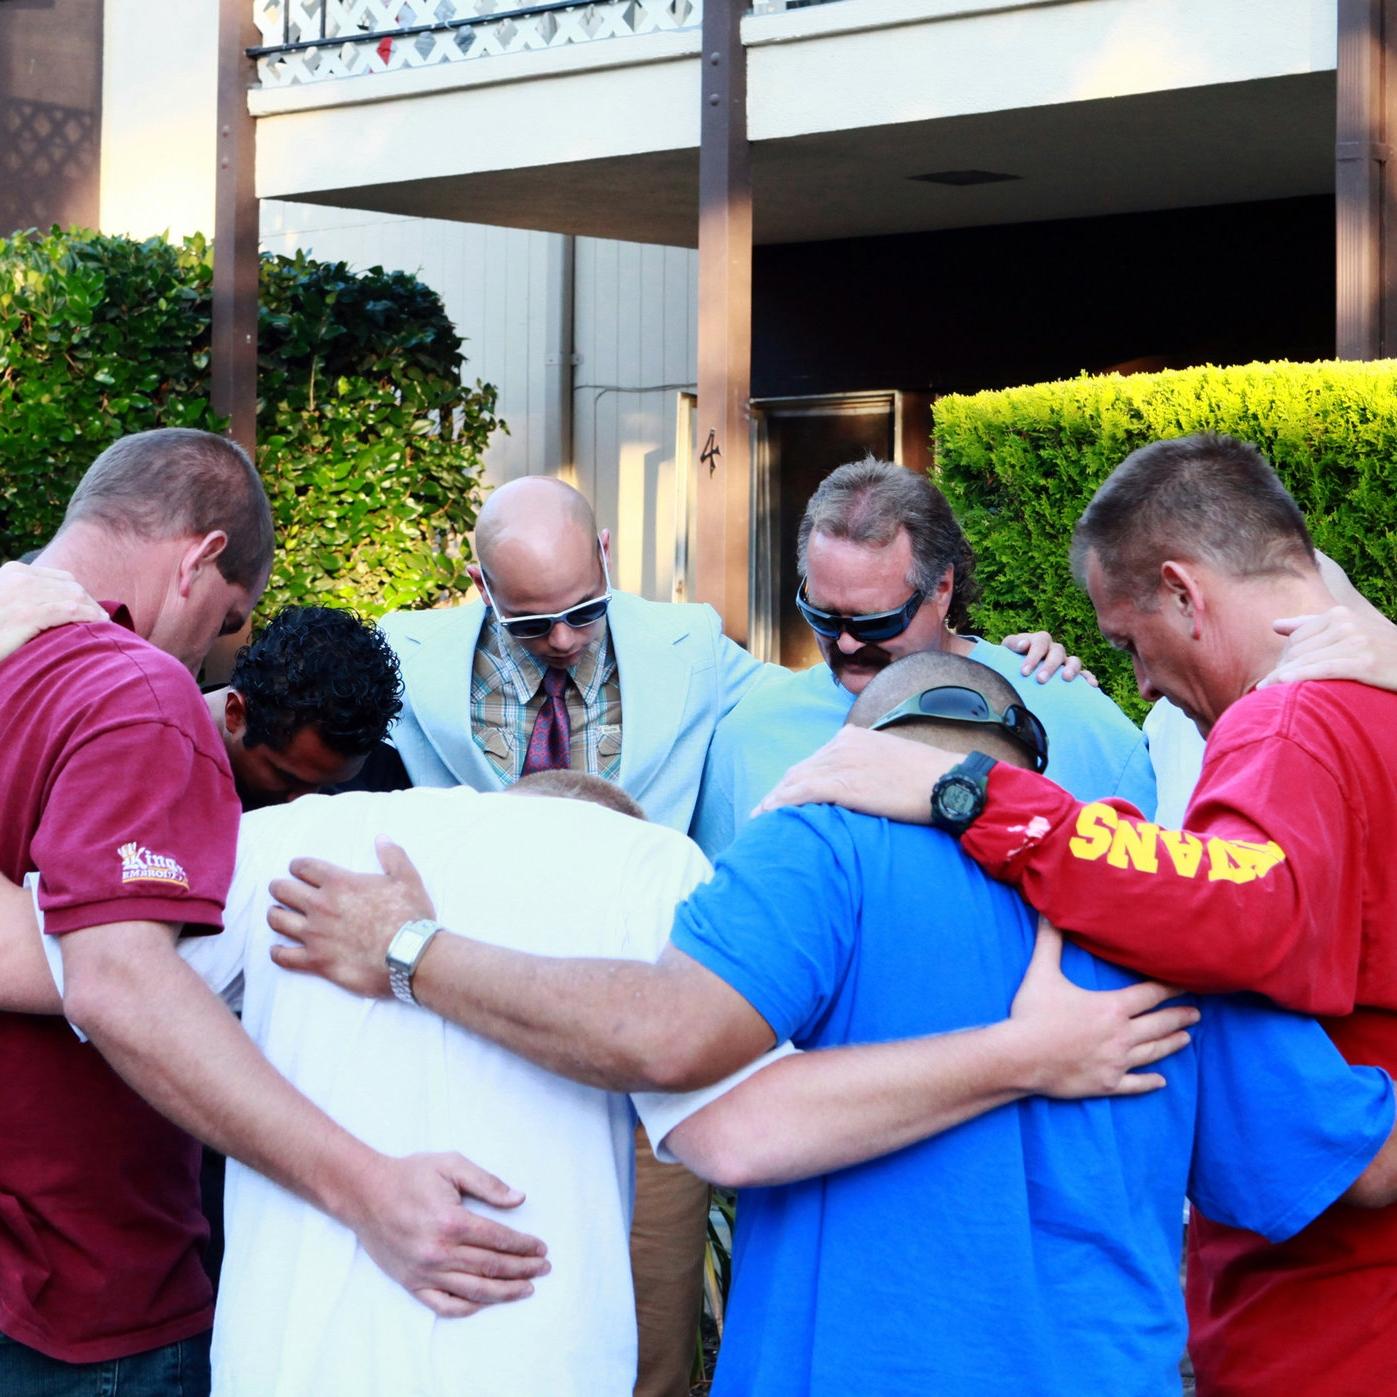 Men at the Sacramento Re-Entry Center for Men, praying in a group.